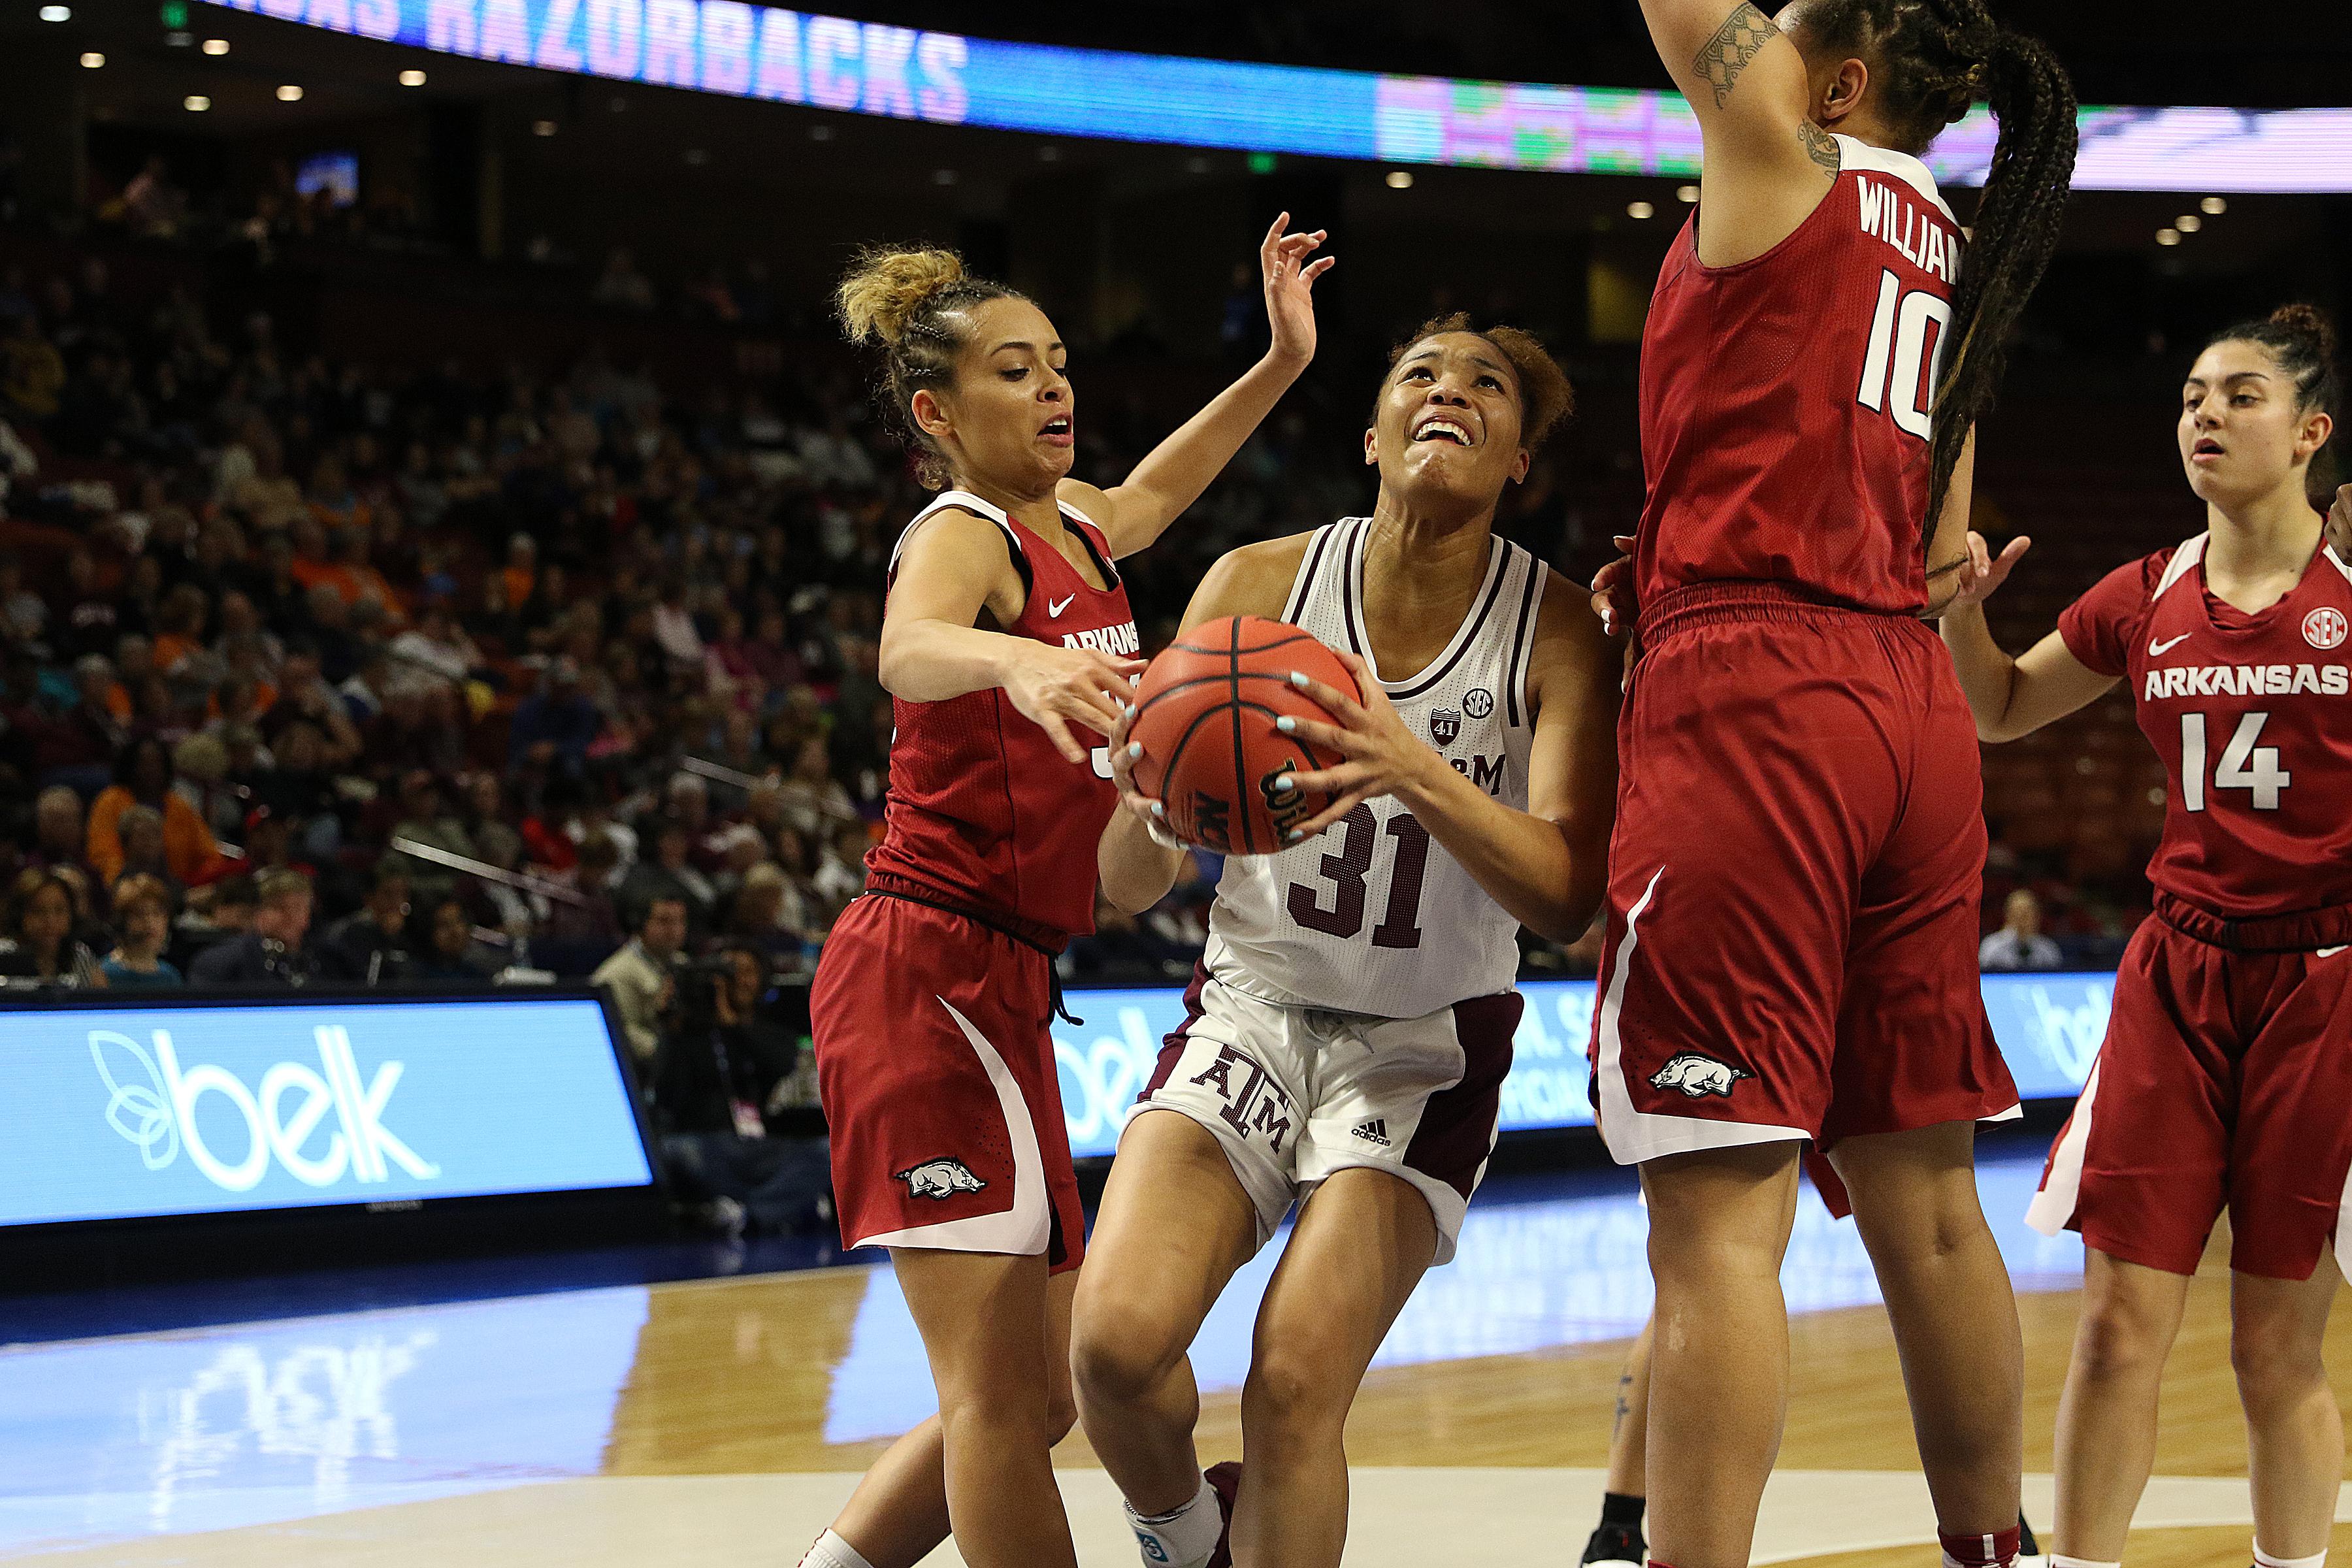 COLLEGE BASKETBALL: MAR 09 SEC Conference Women's Tournament - Arkansas vs Texas A&M